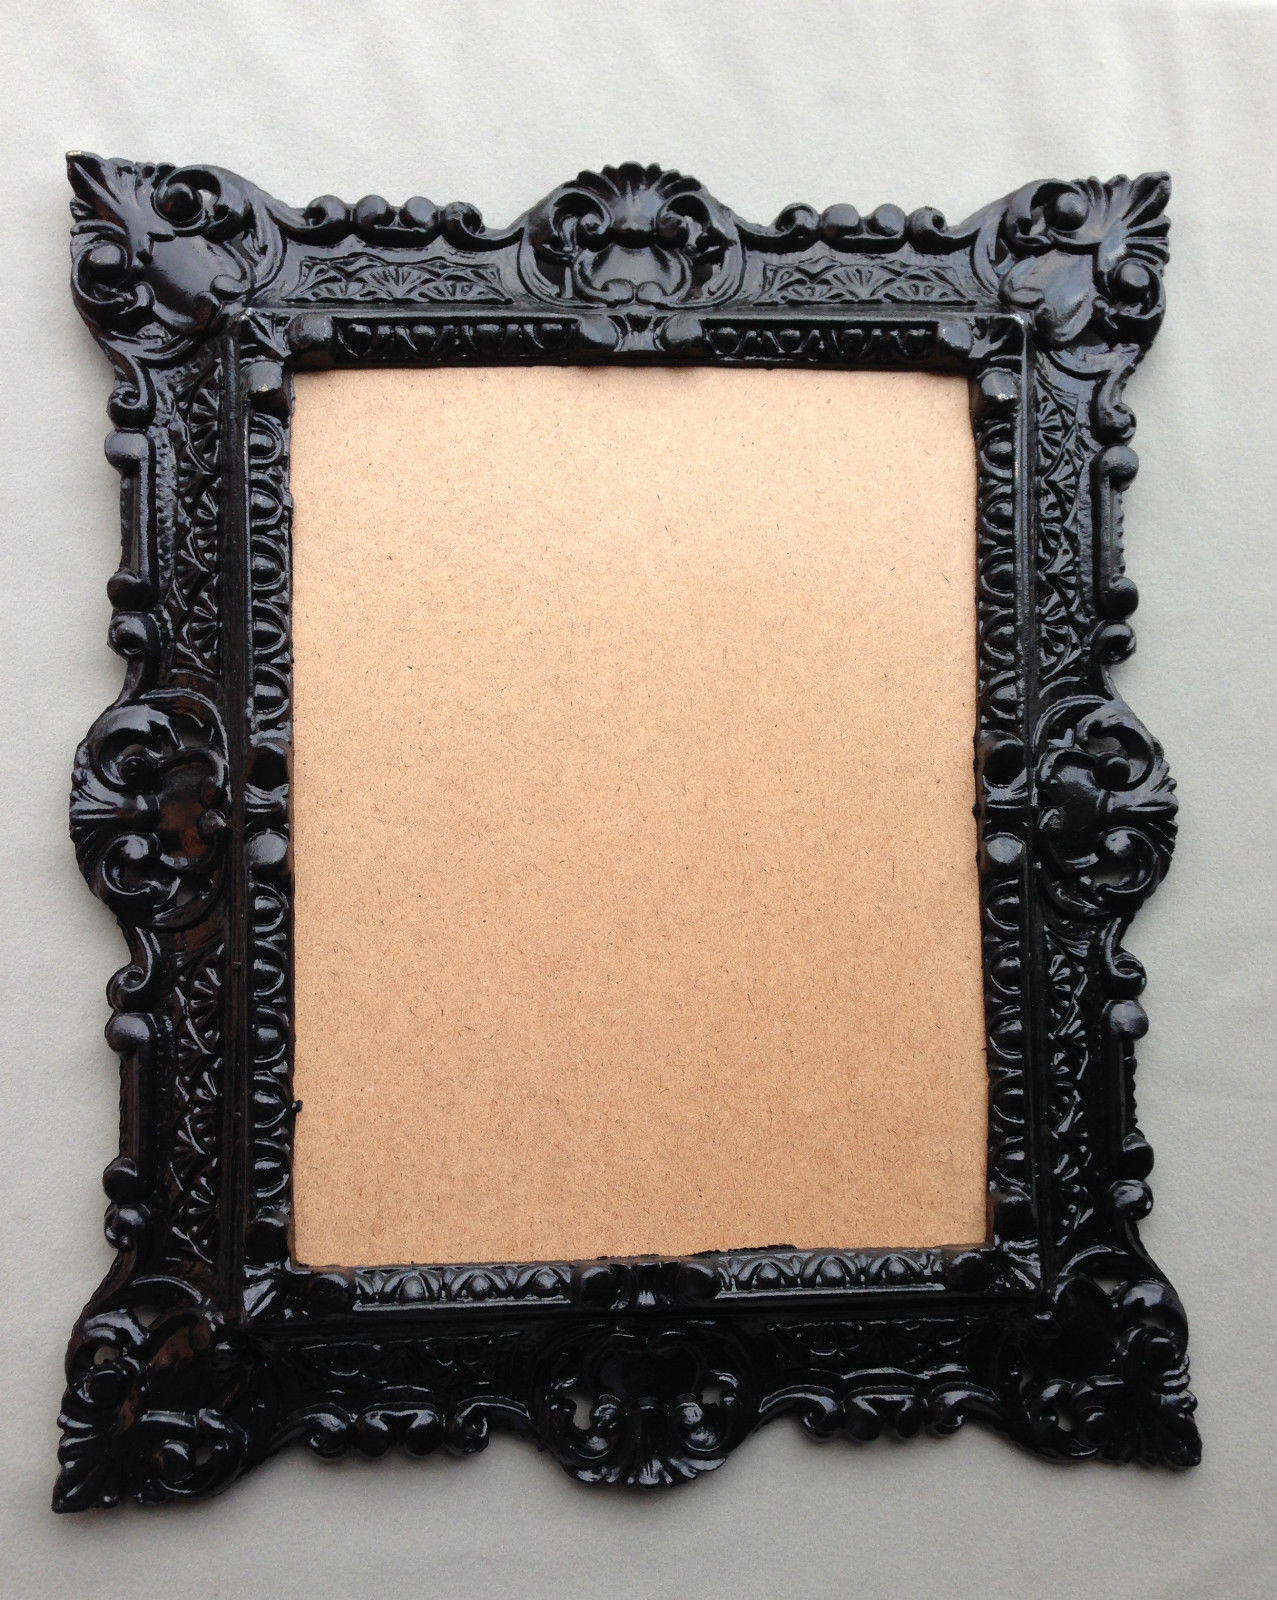 bilderrahmen schwarz rechteckig barock rahmen antik 44x38 fotorahmen mit glas kaufen bei. Black Bedroom Furniture Sets. Home Design Ideas